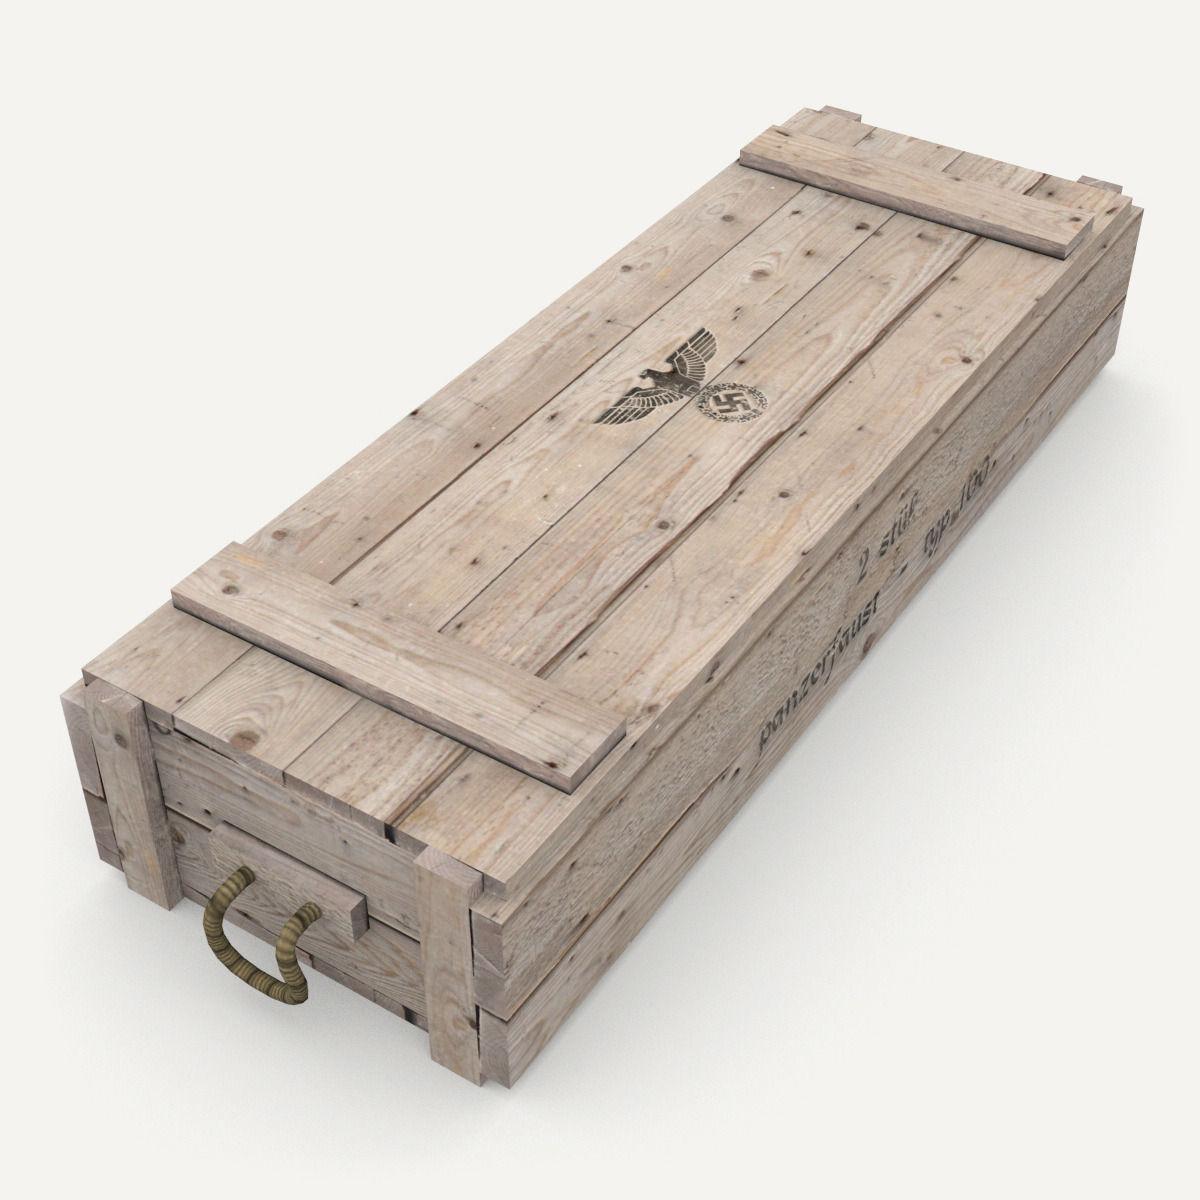 German army crate